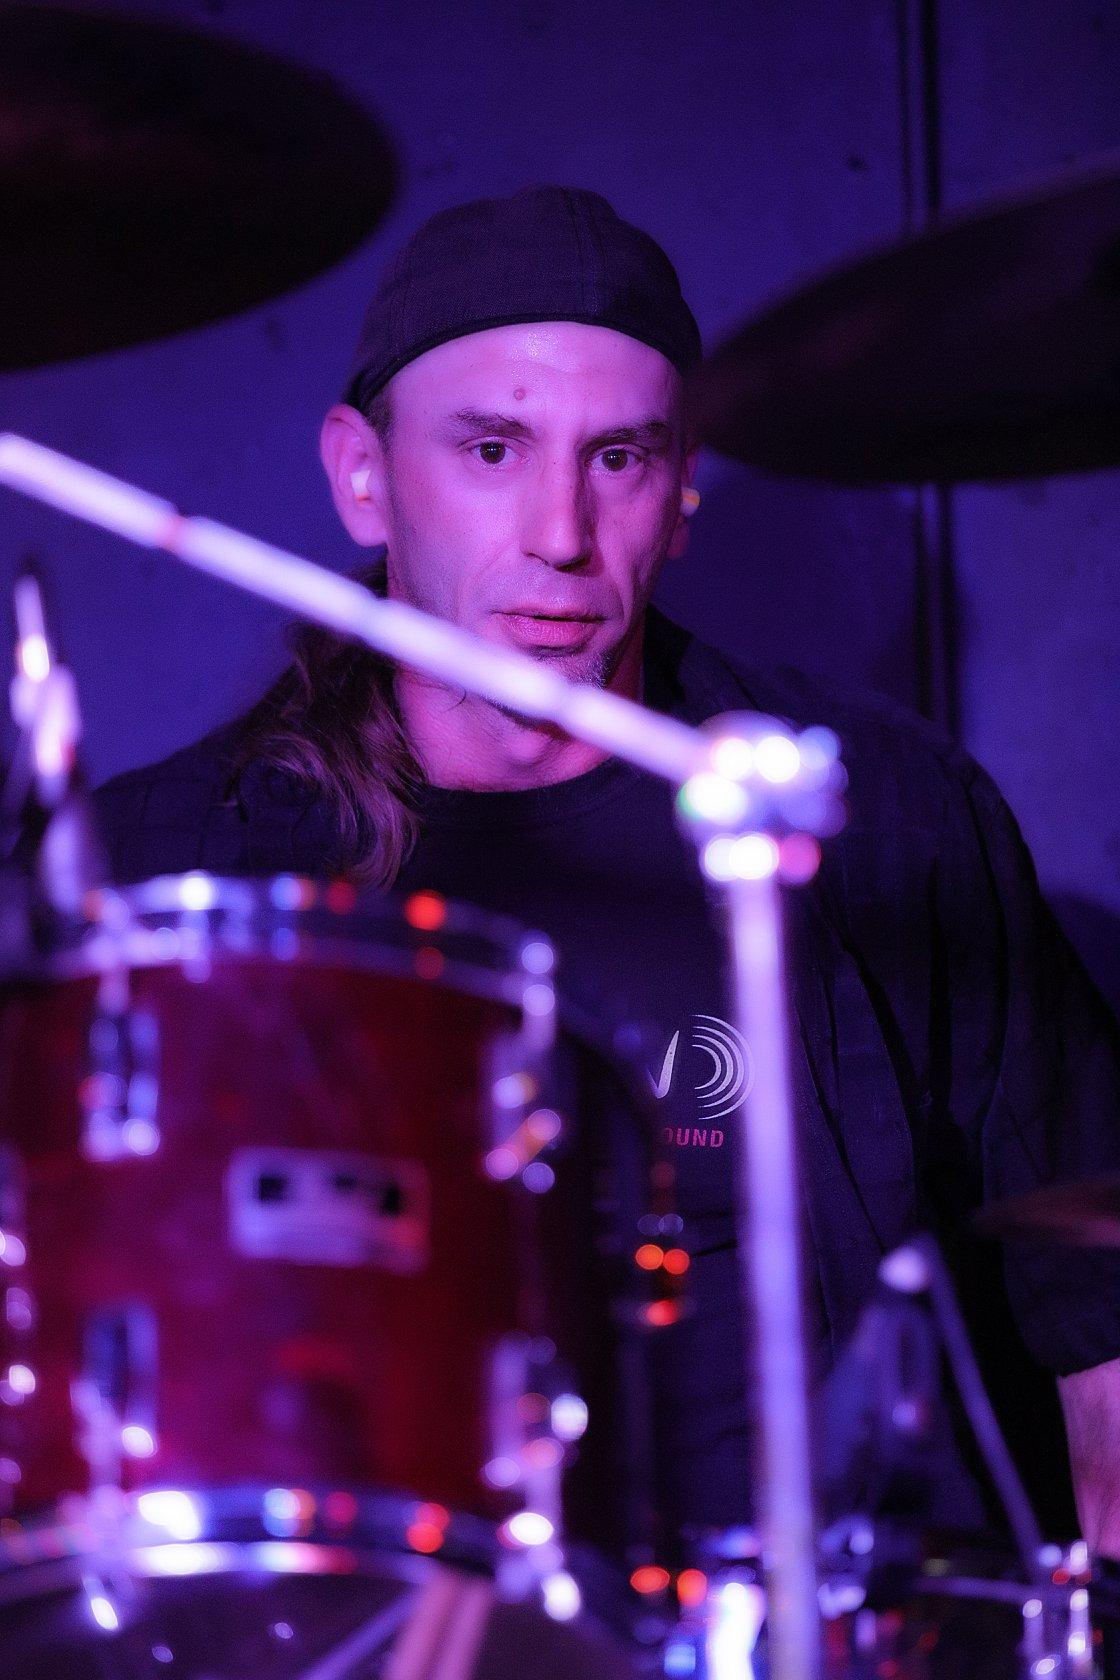 Photo by Scott Clift